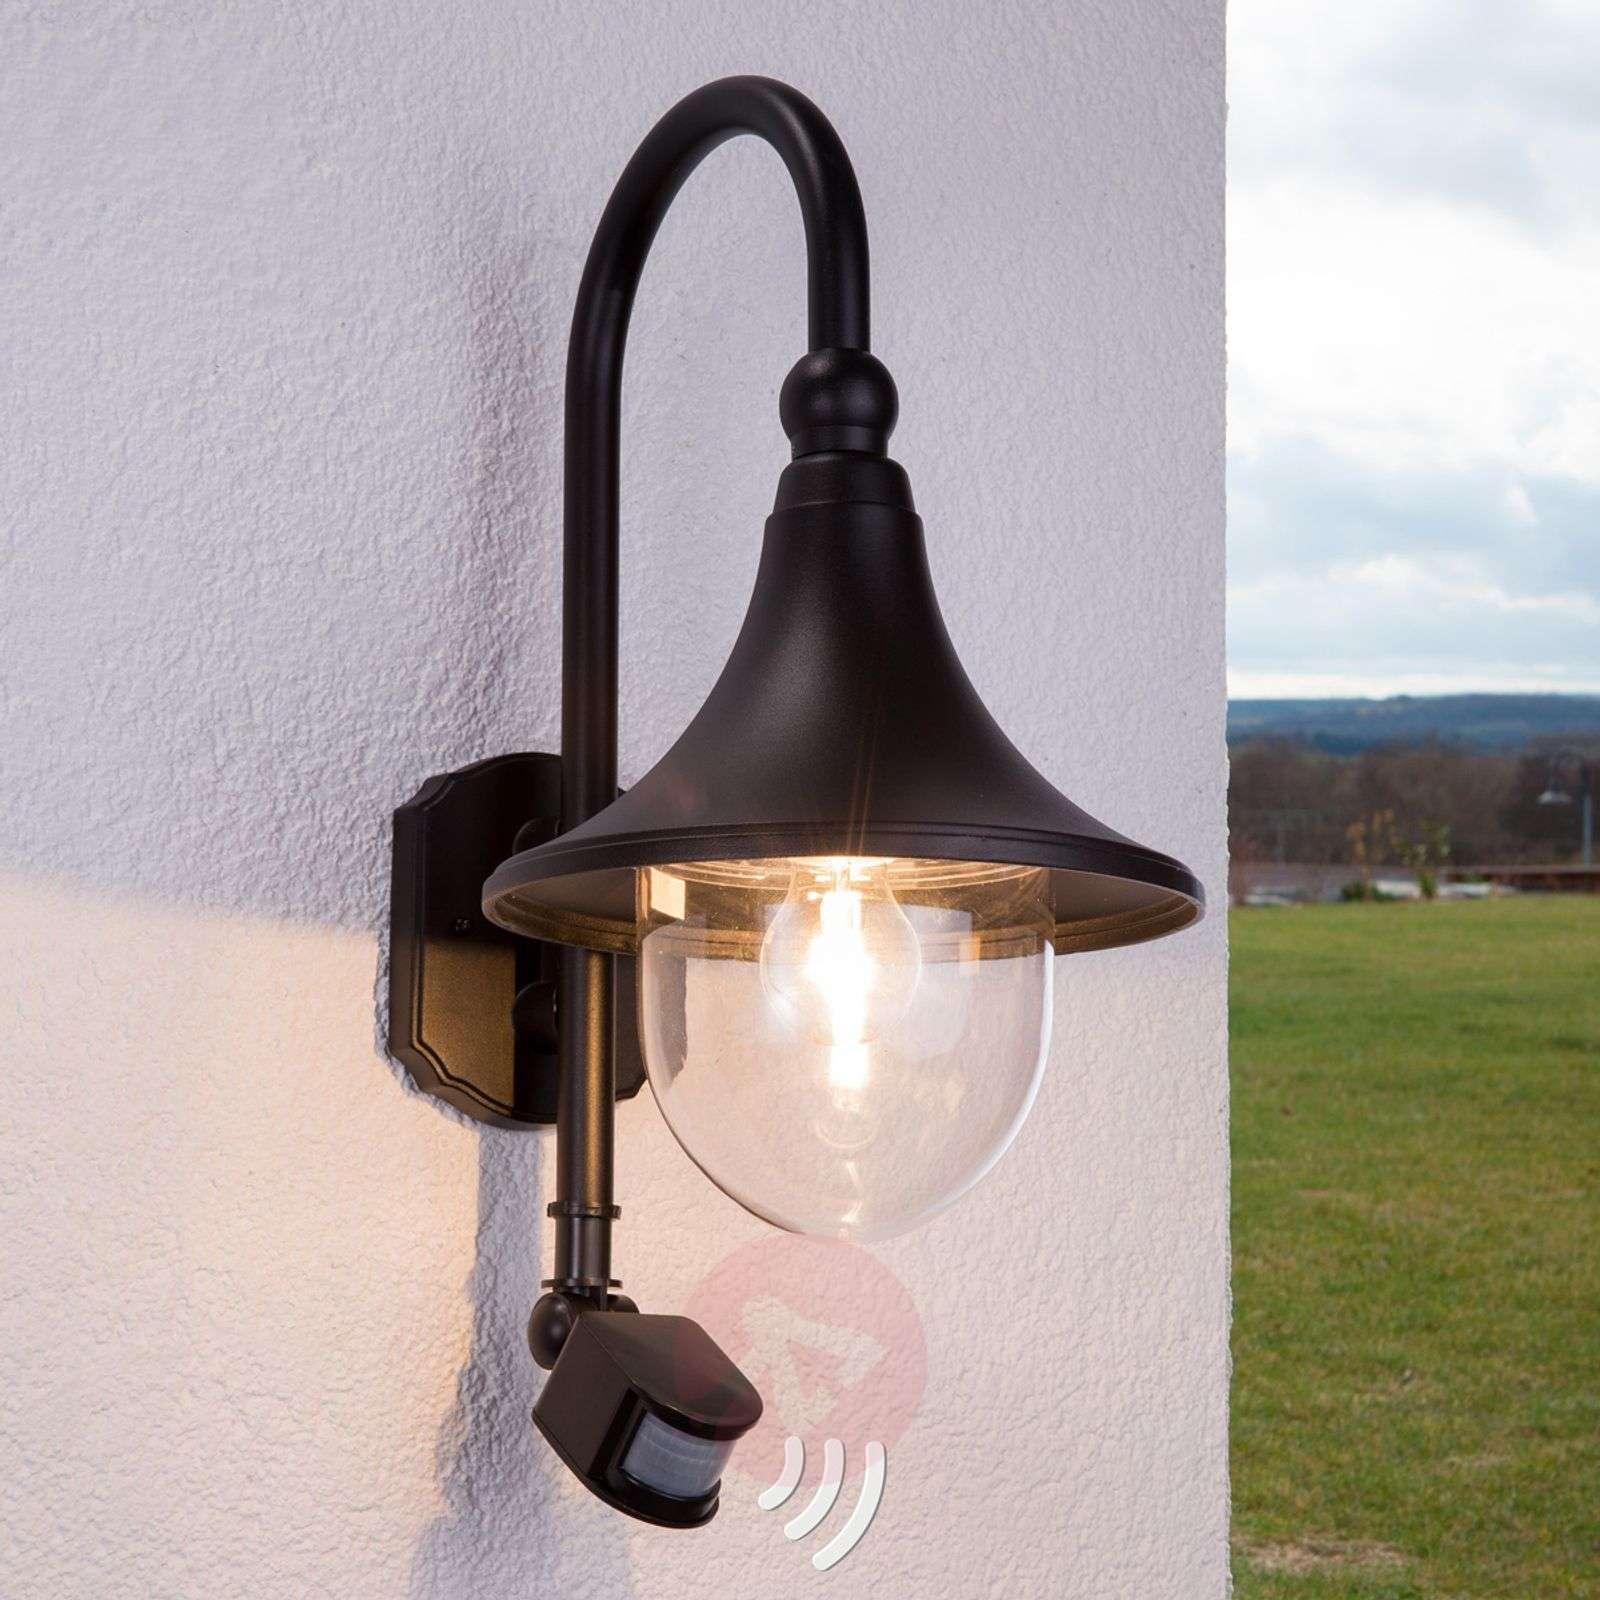 Daphne outdoor wall light with sensor, black-9611082-01